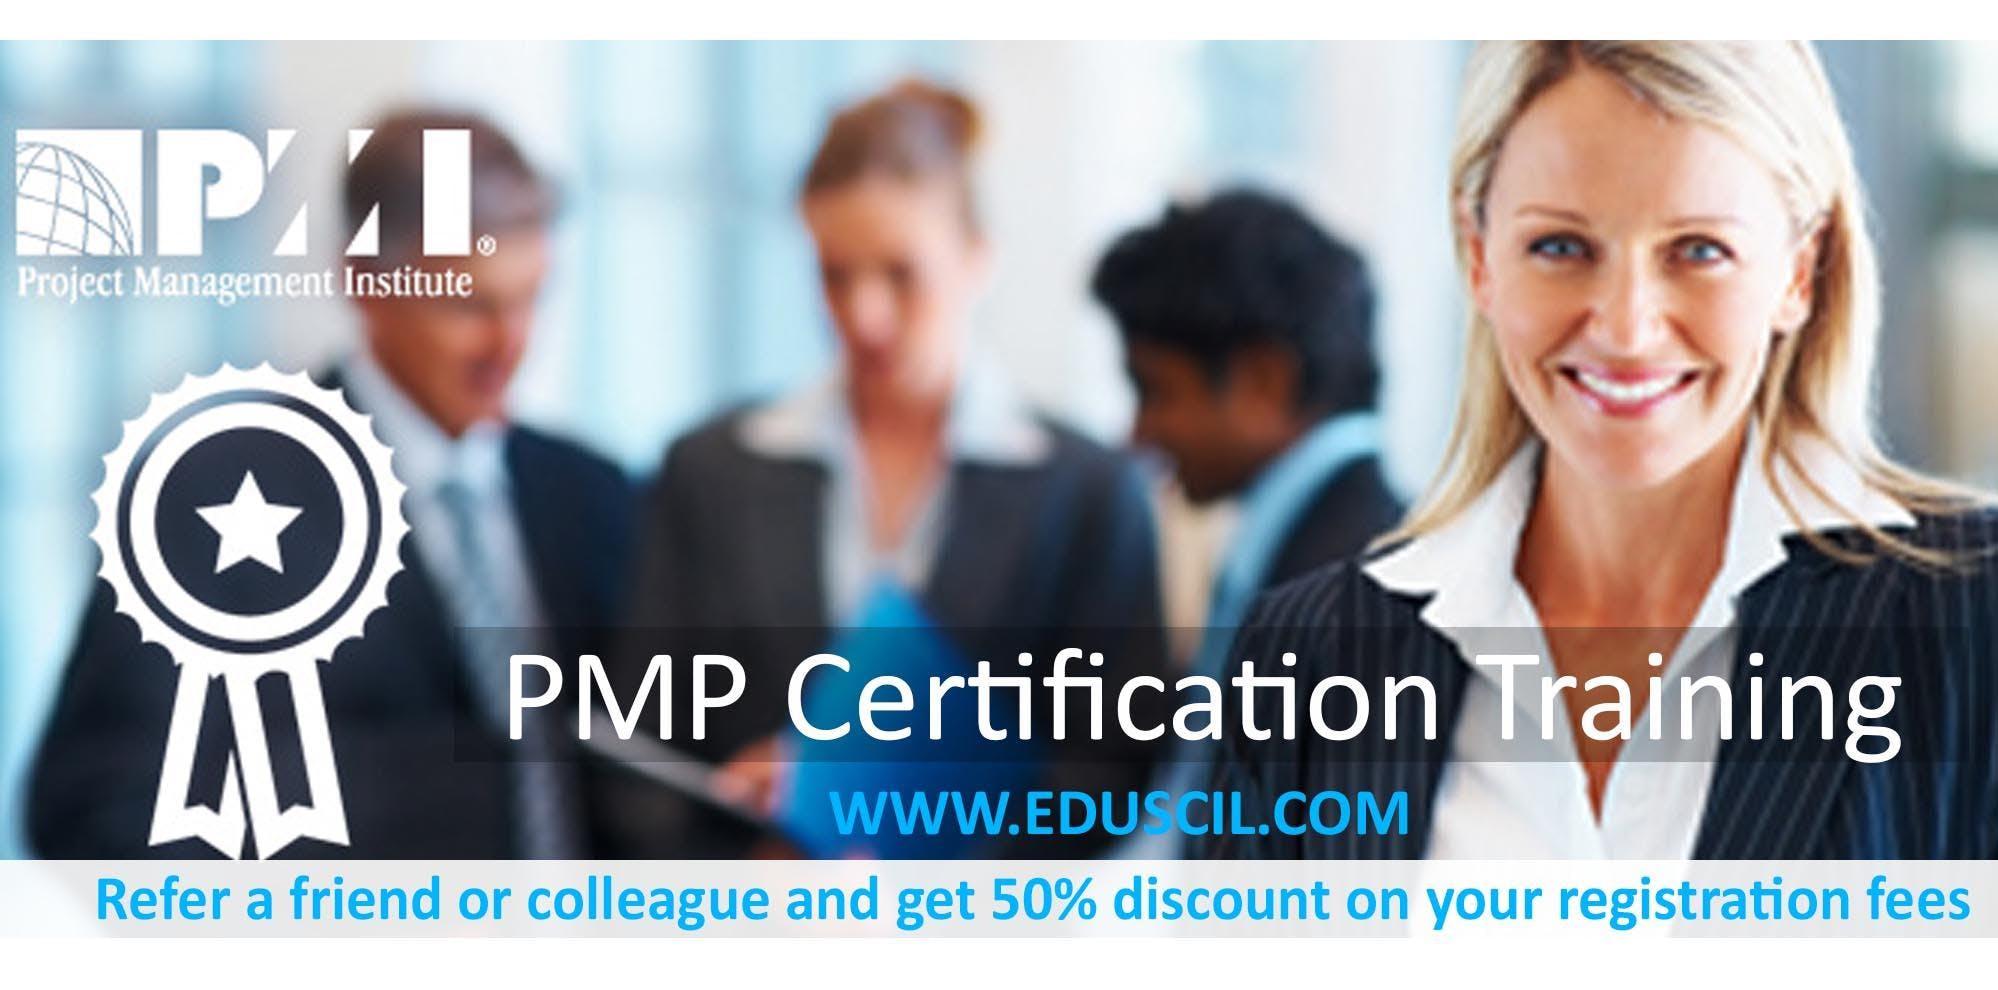 PMP Certification Training Course in Grand Rapids MI- USA  Eduscil